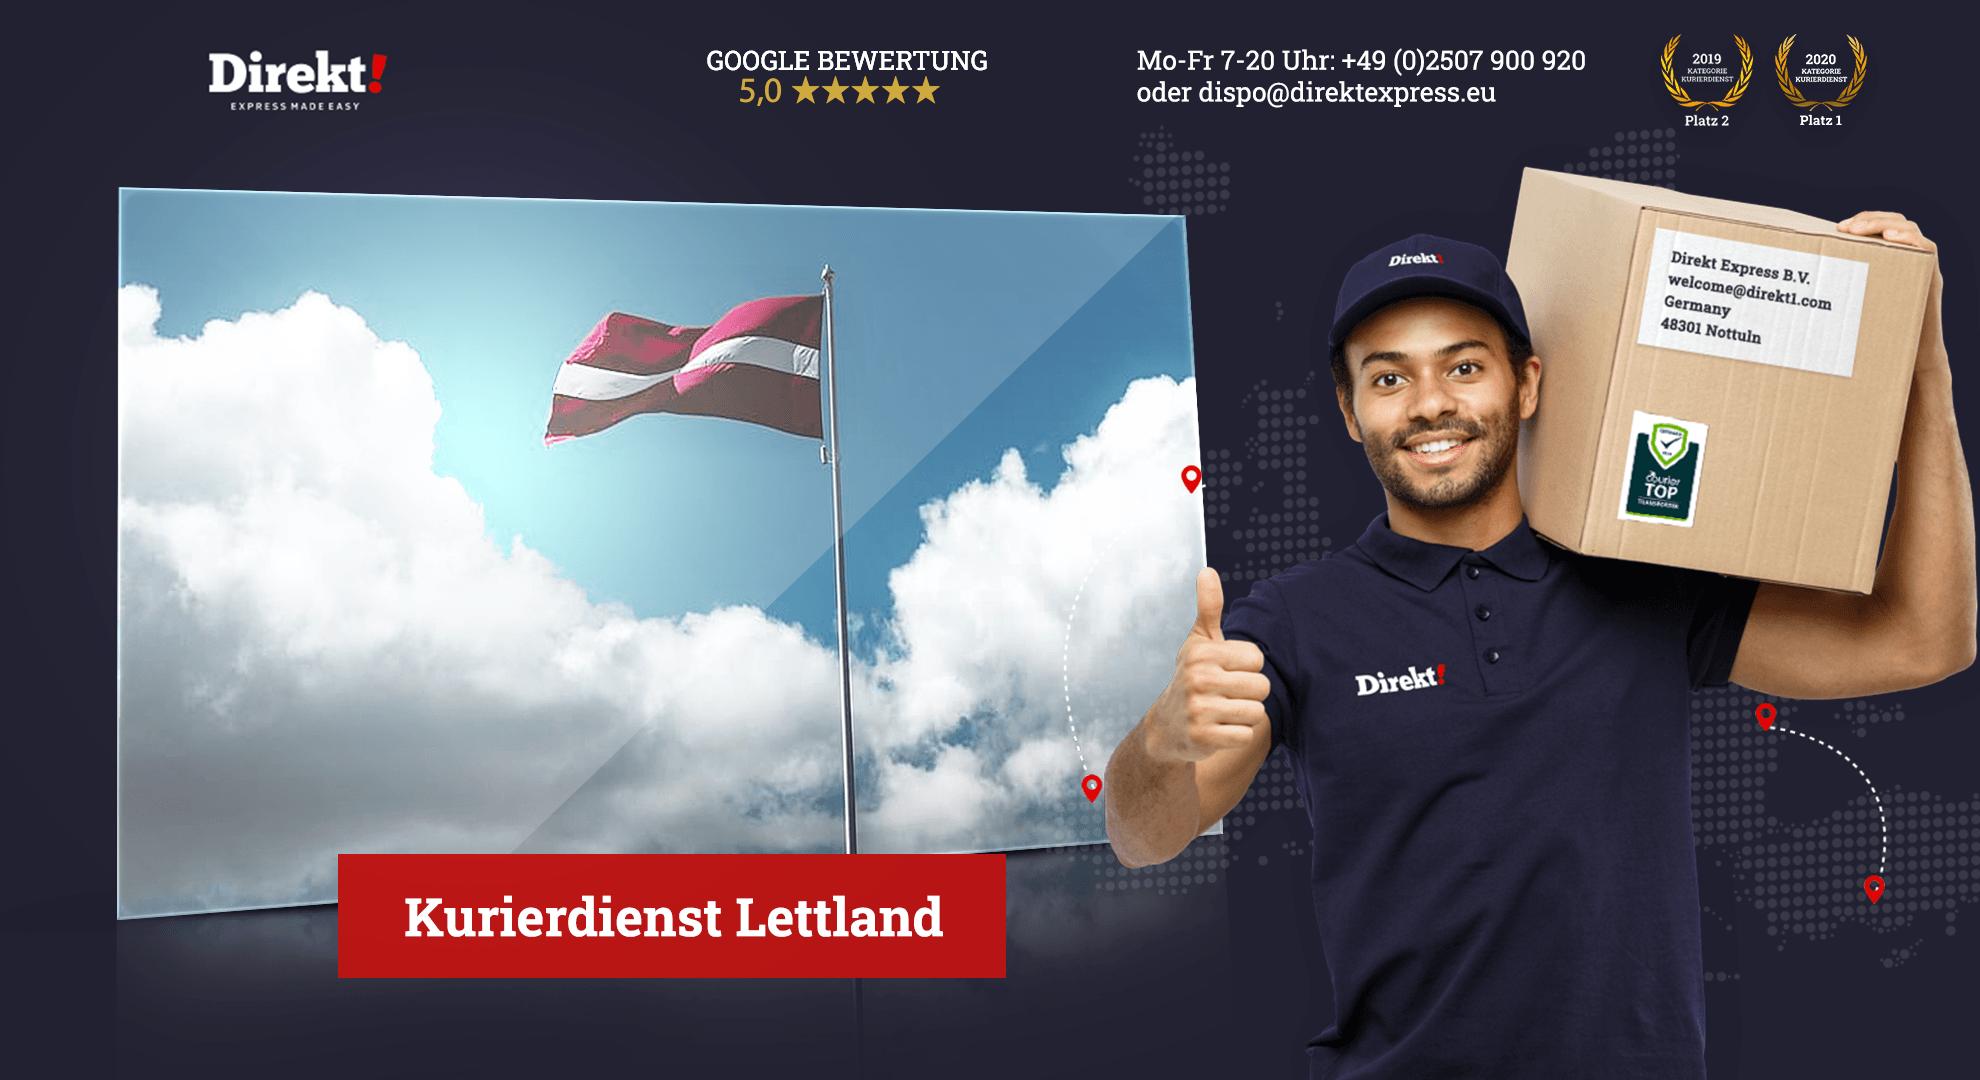 https://direkt1.com/wp-content/uploads/2021/04/Kurierdienst-lettland-buchen.png